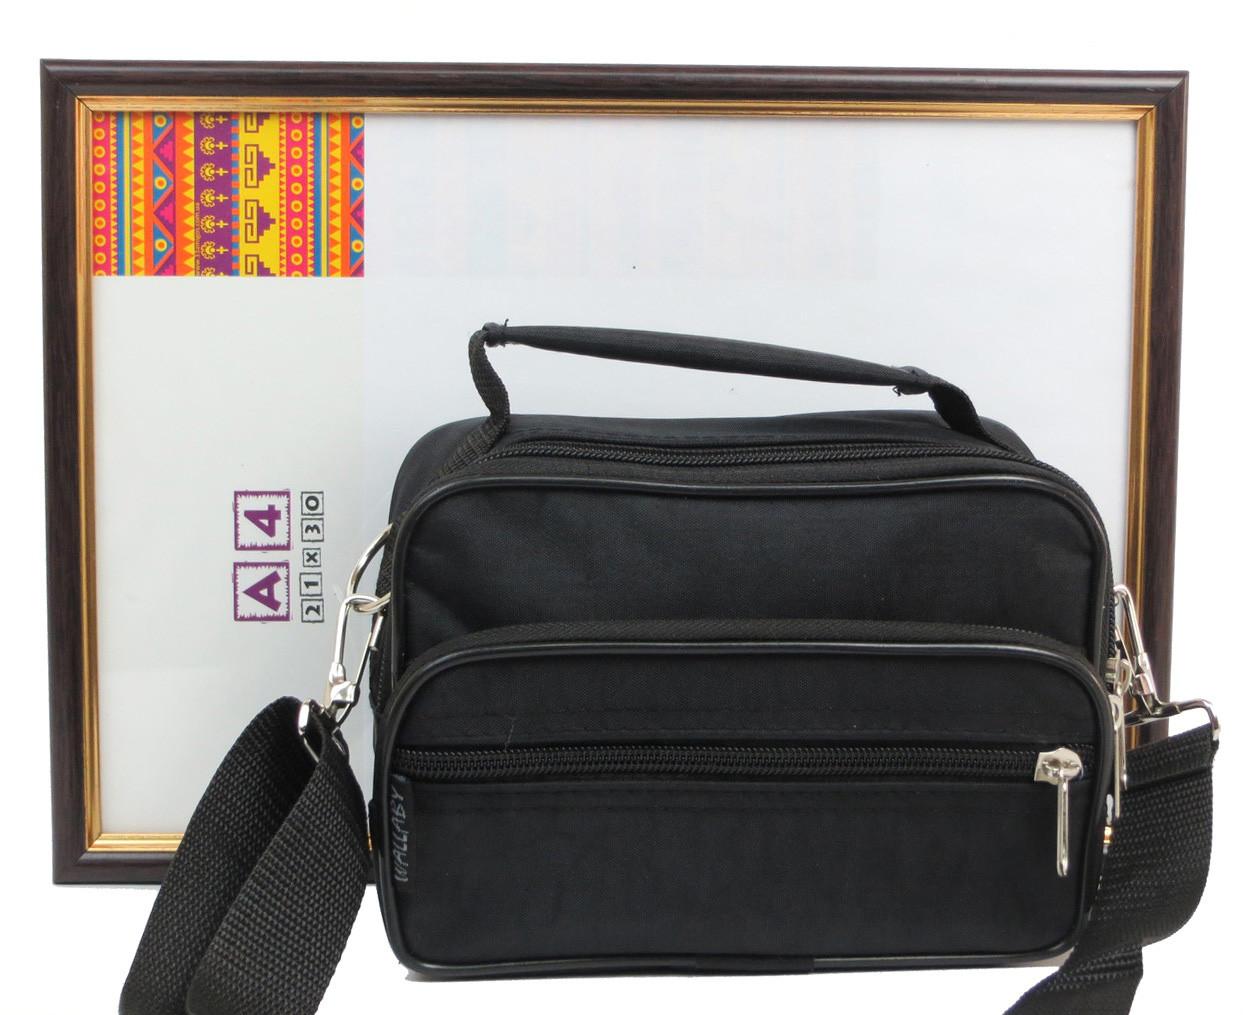 4ad936fde368 Мужская сумка через плечо Wallaby 2663 черная барсетка на пояс 19х14х7см,  цена 128 грн., купить в Харькове — Prom.ua (ID#349036750)